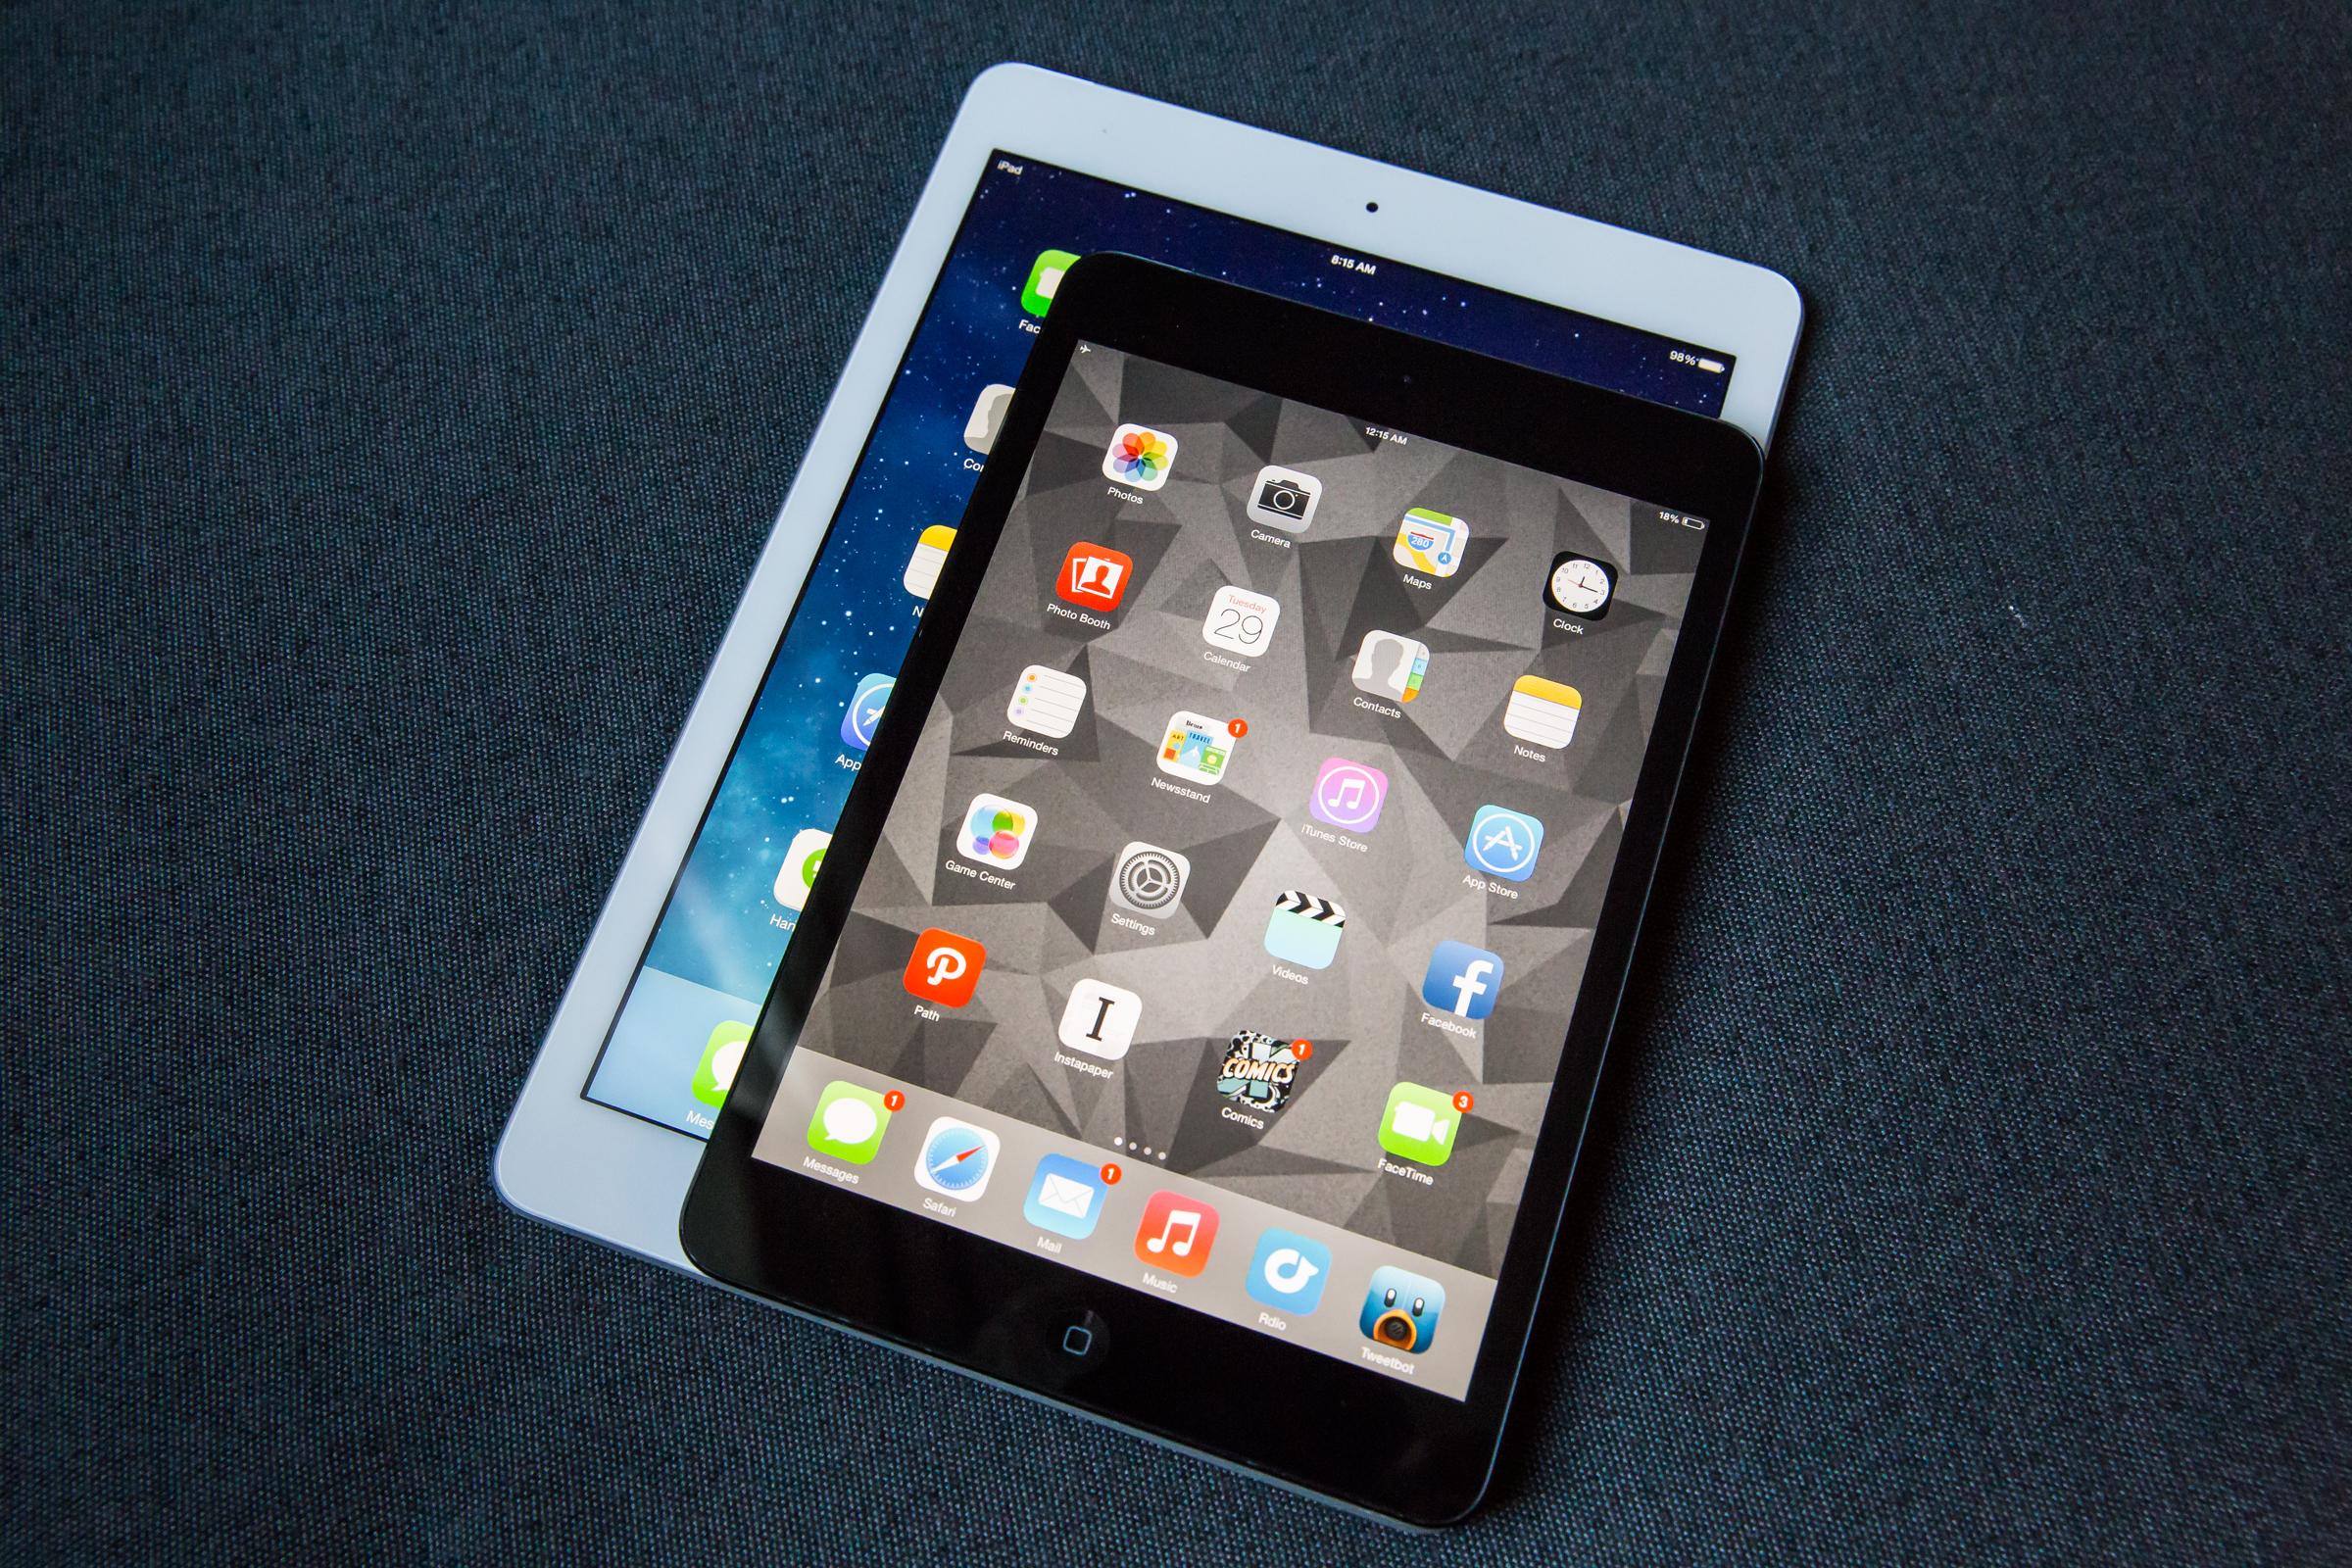 Surprise! Apple's iPad Mini With Retina Display Now On ...